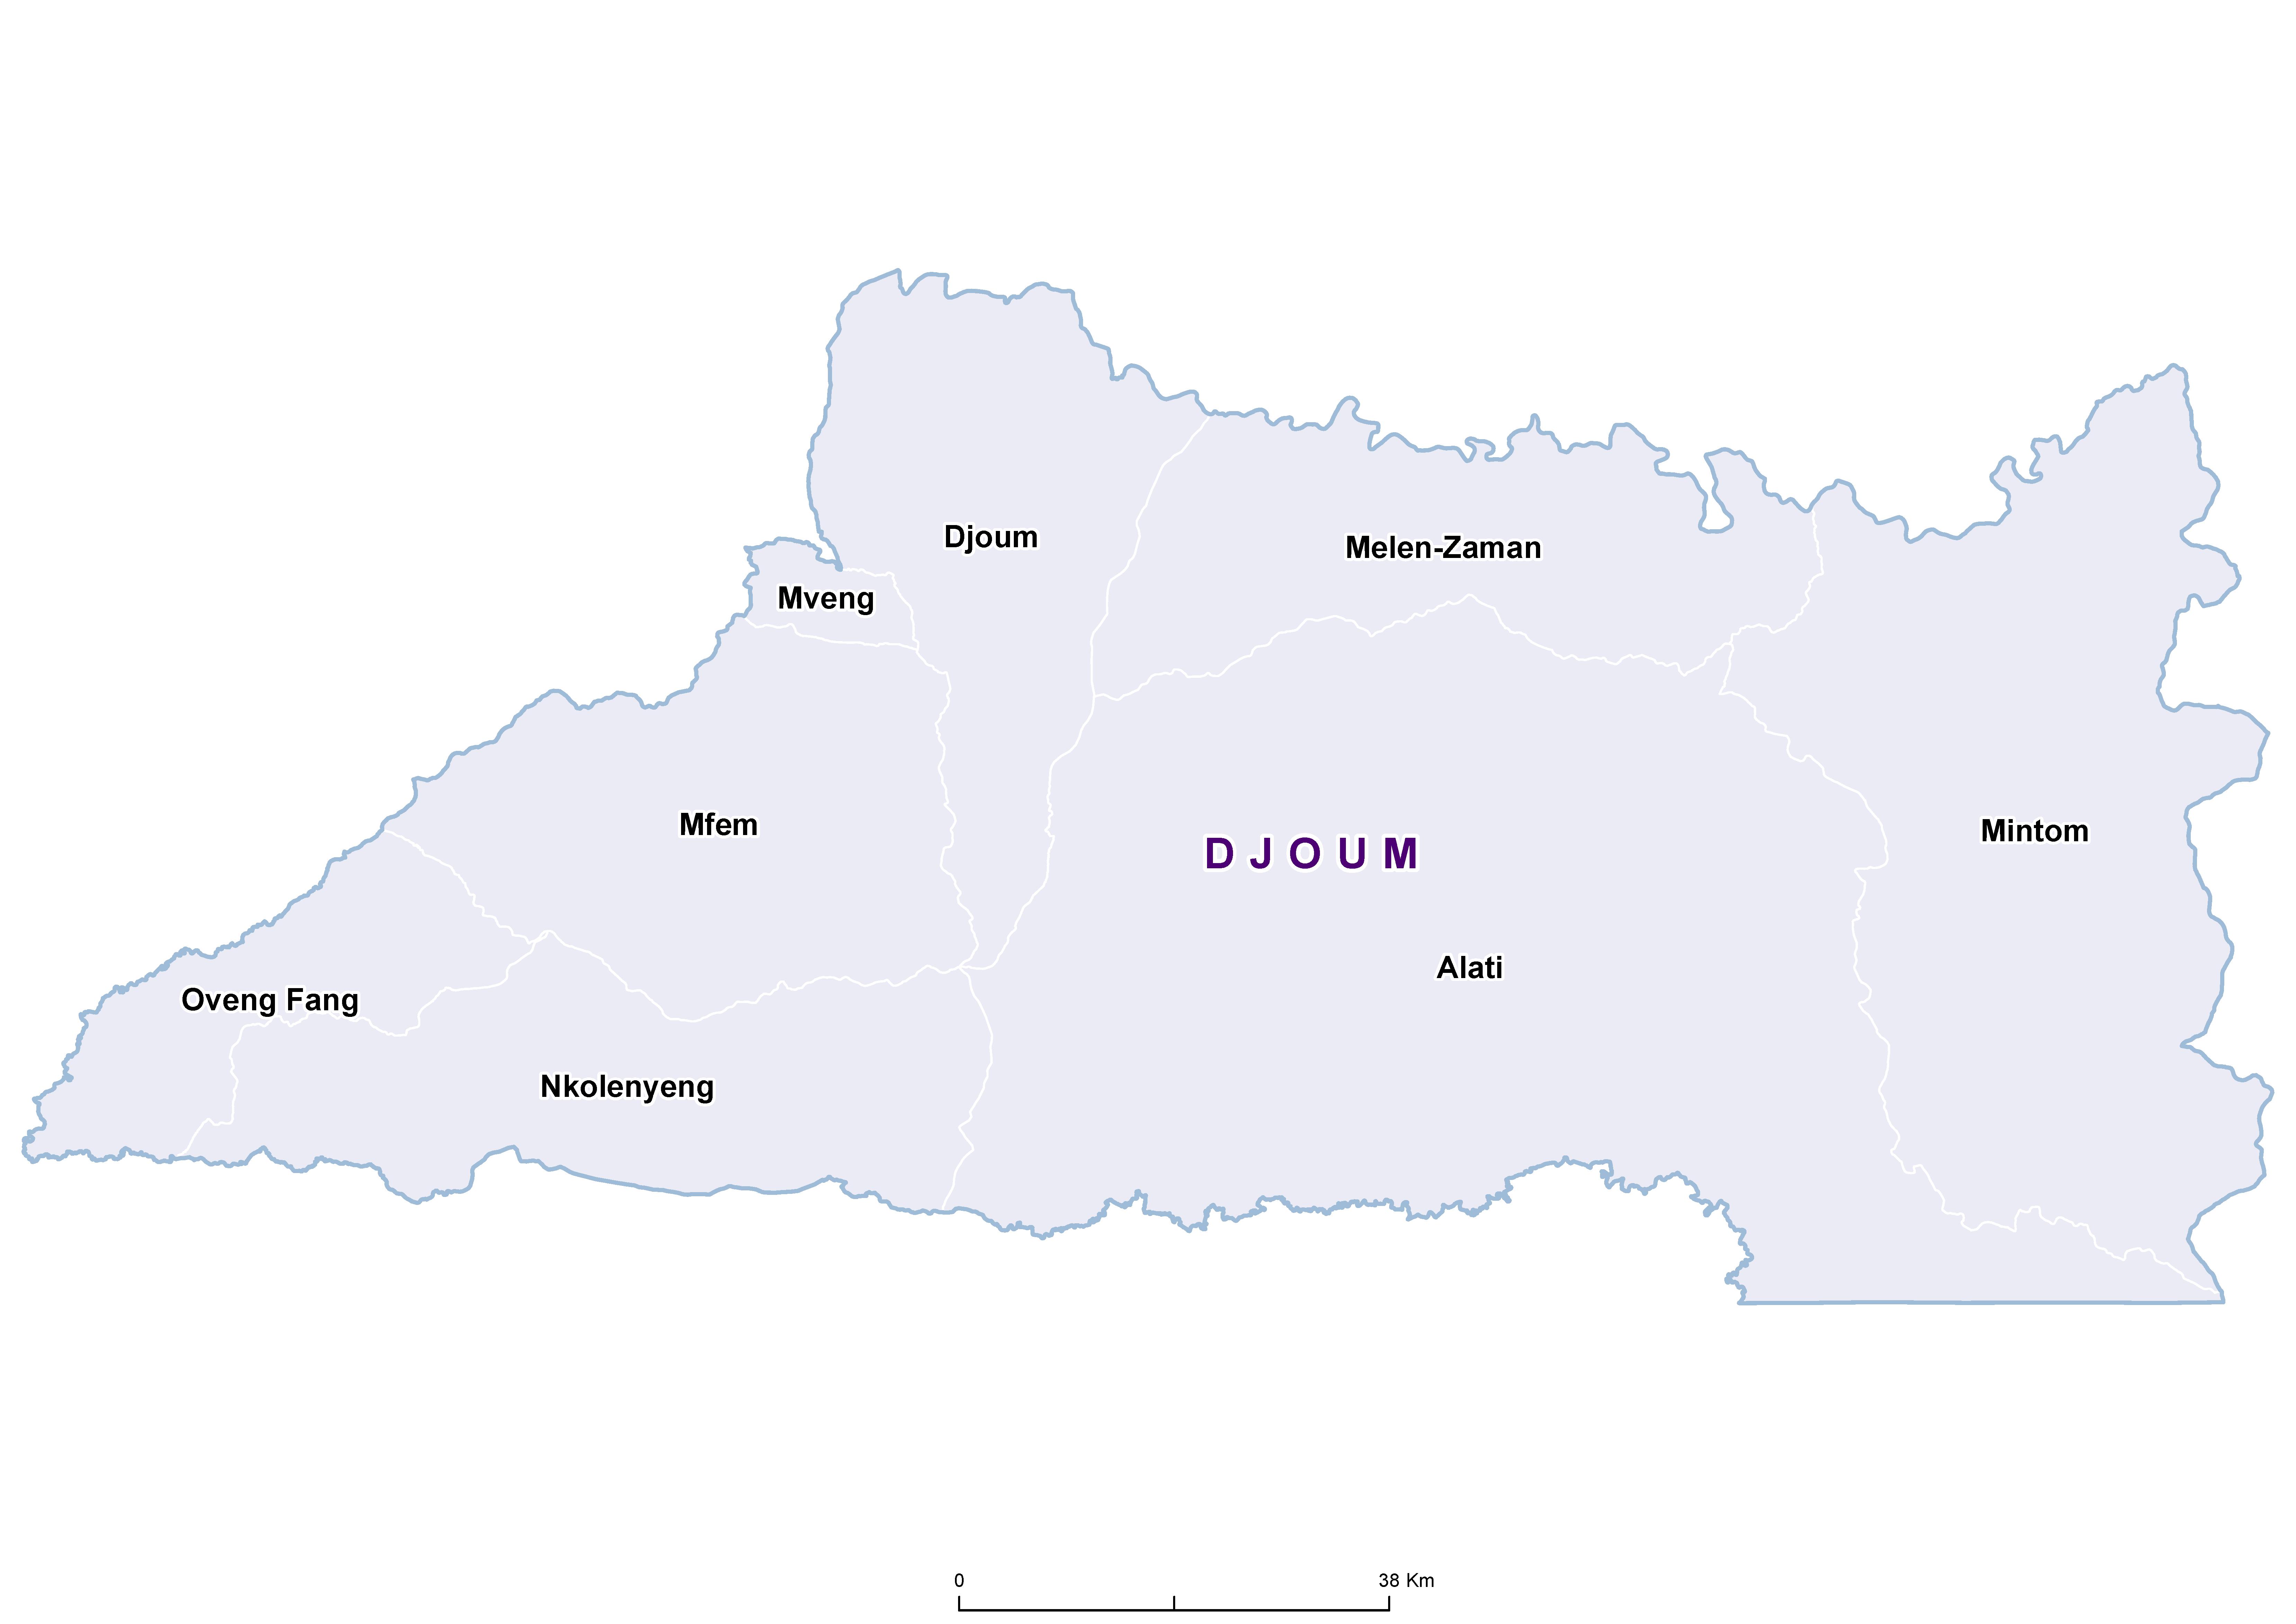 Djoum STH 20180001